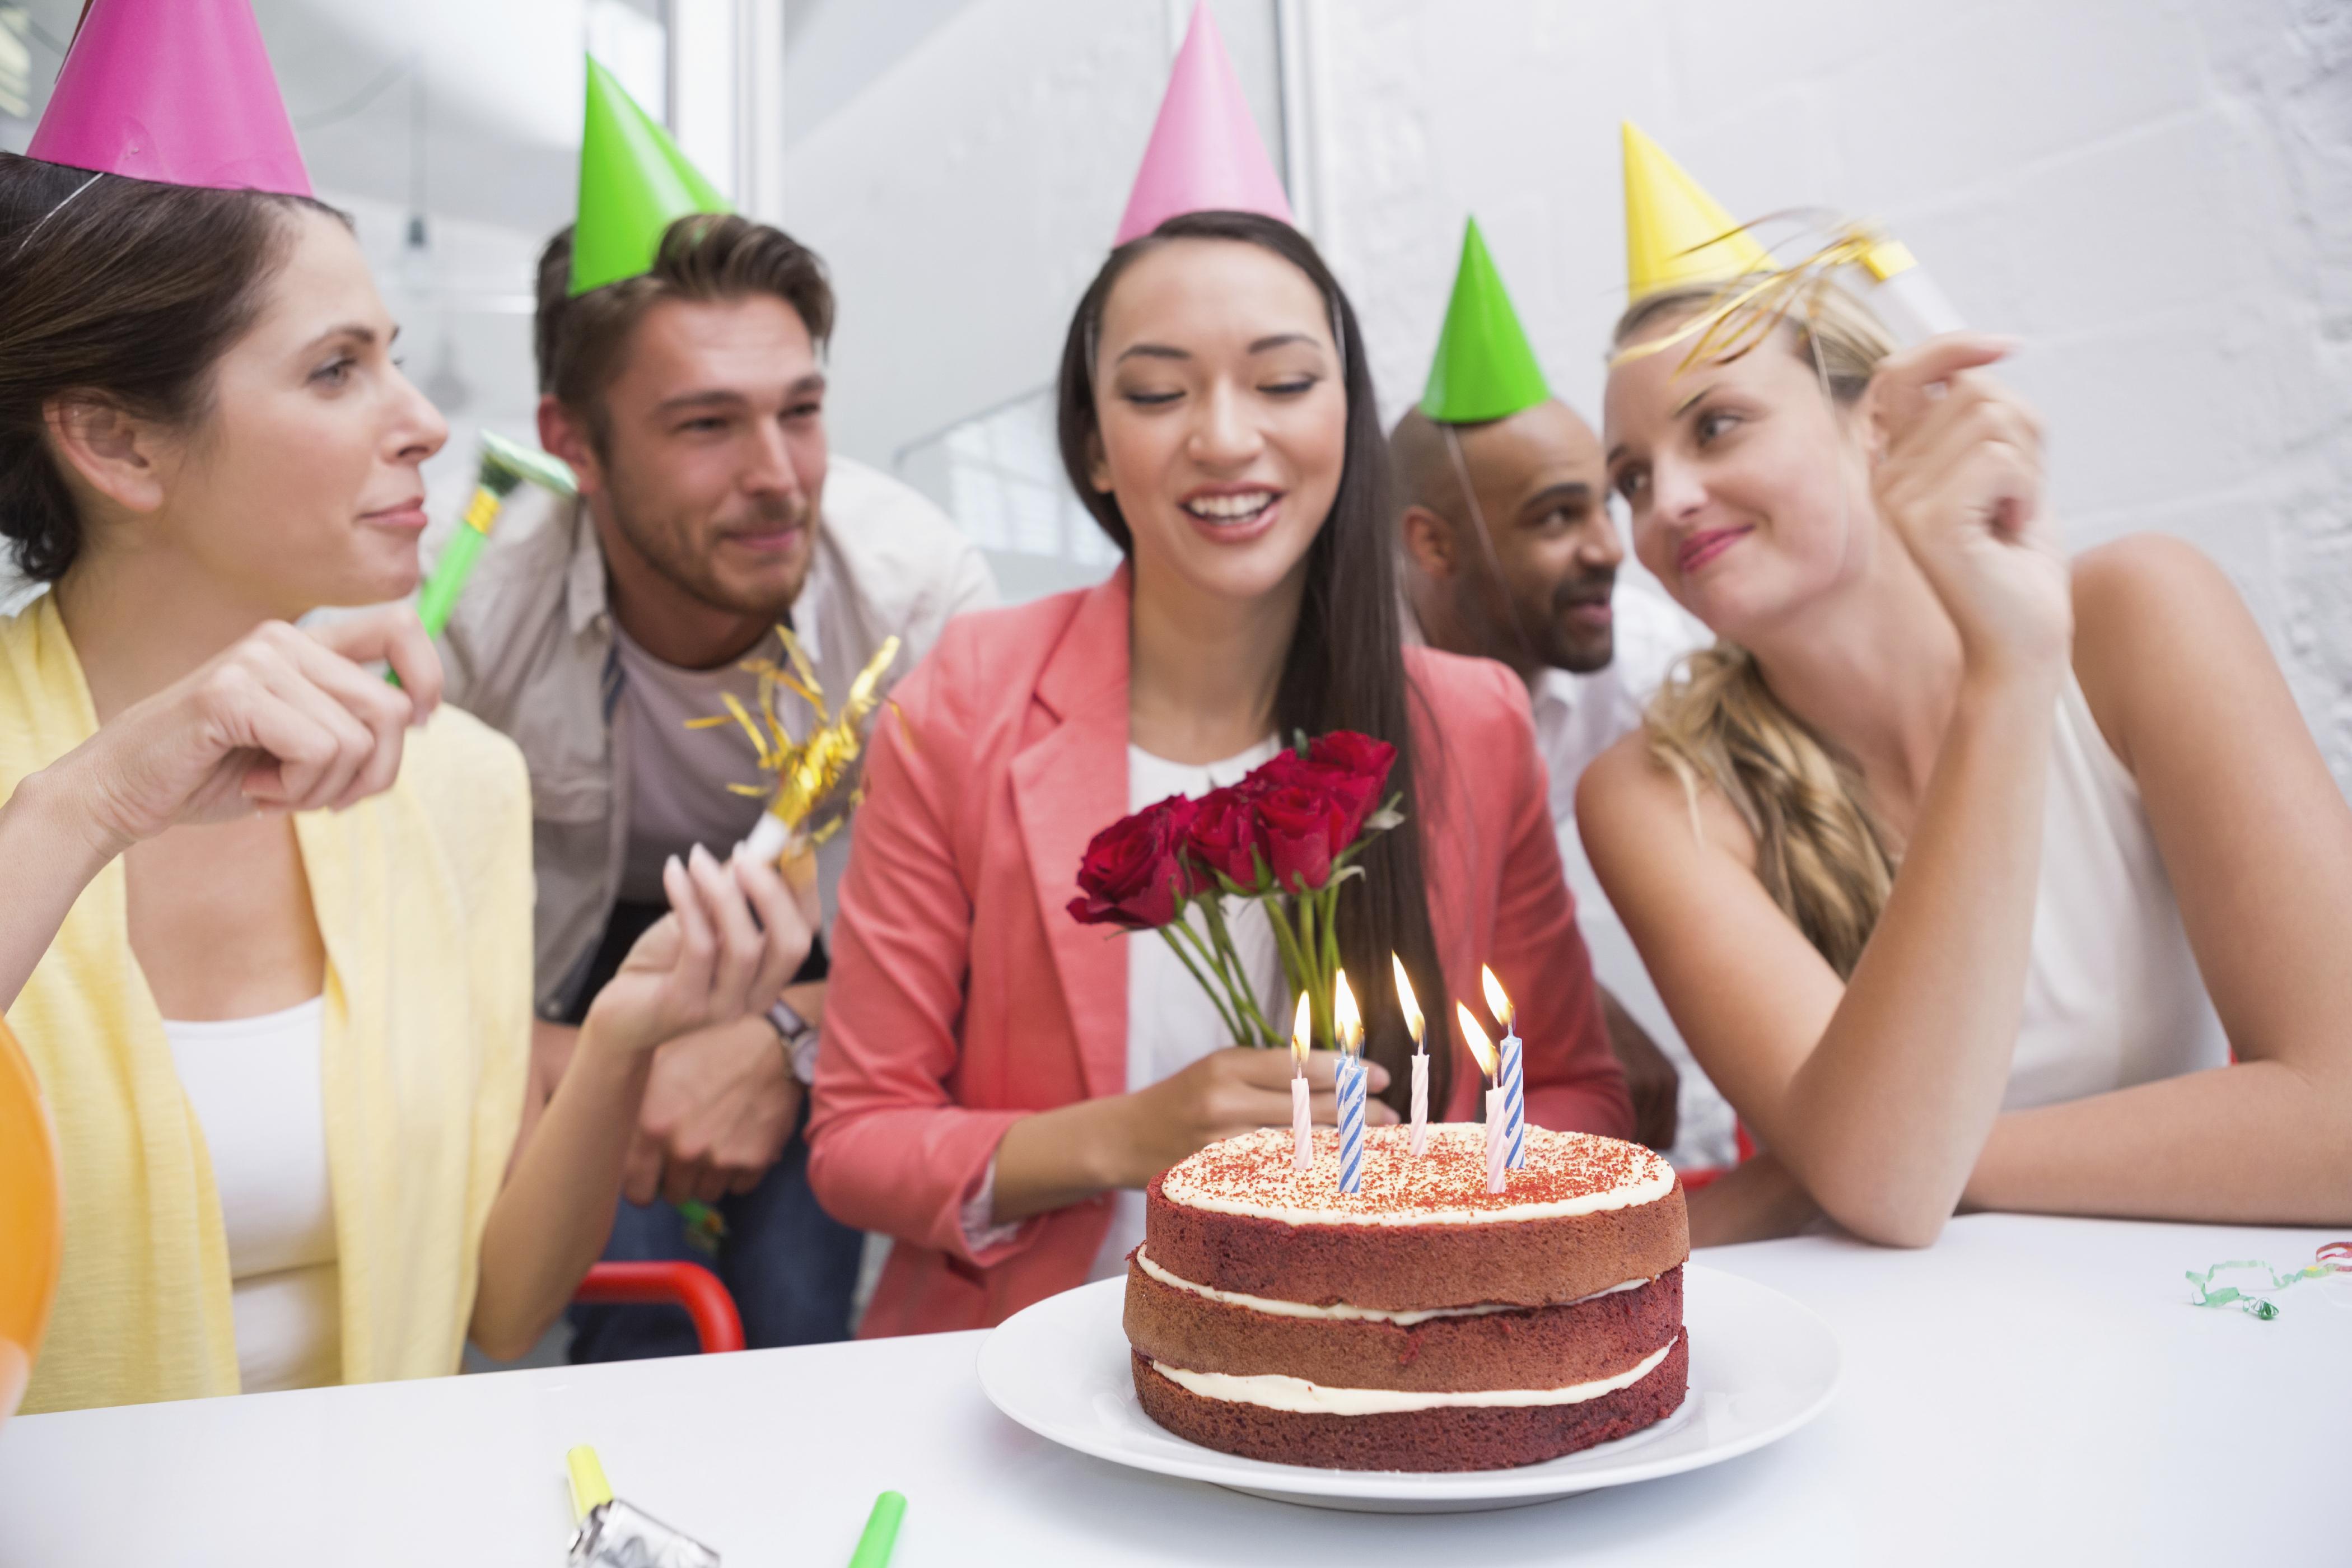 Geburtstag Im Buro Feiern Dos And Don Ts Desired De